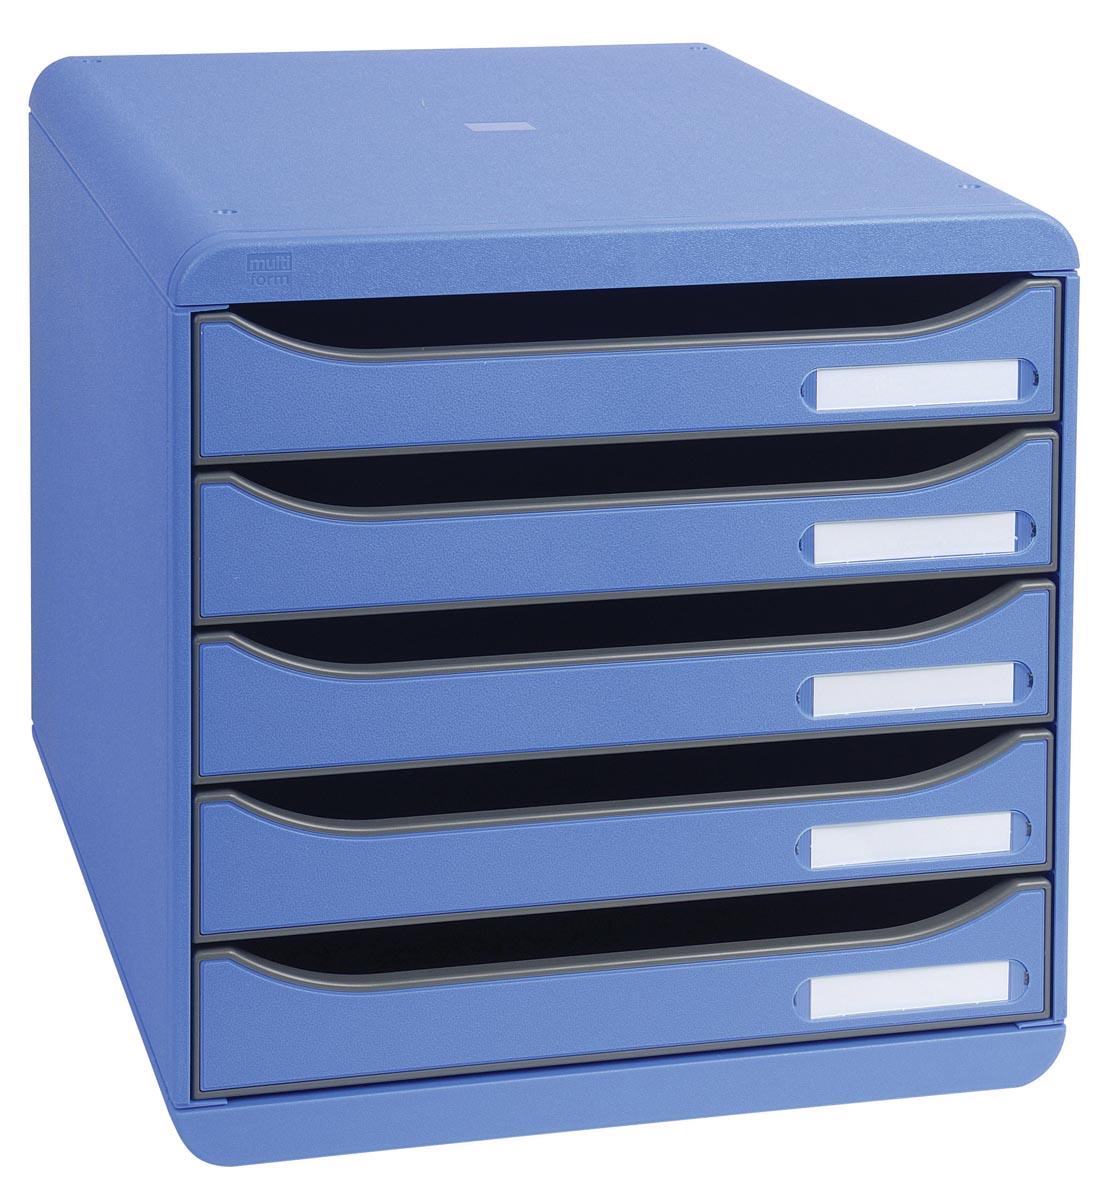 Exacompta Classic Ladenkastje Blauw A4 Plastic 27 8 x 34 7 x 27 1 cm